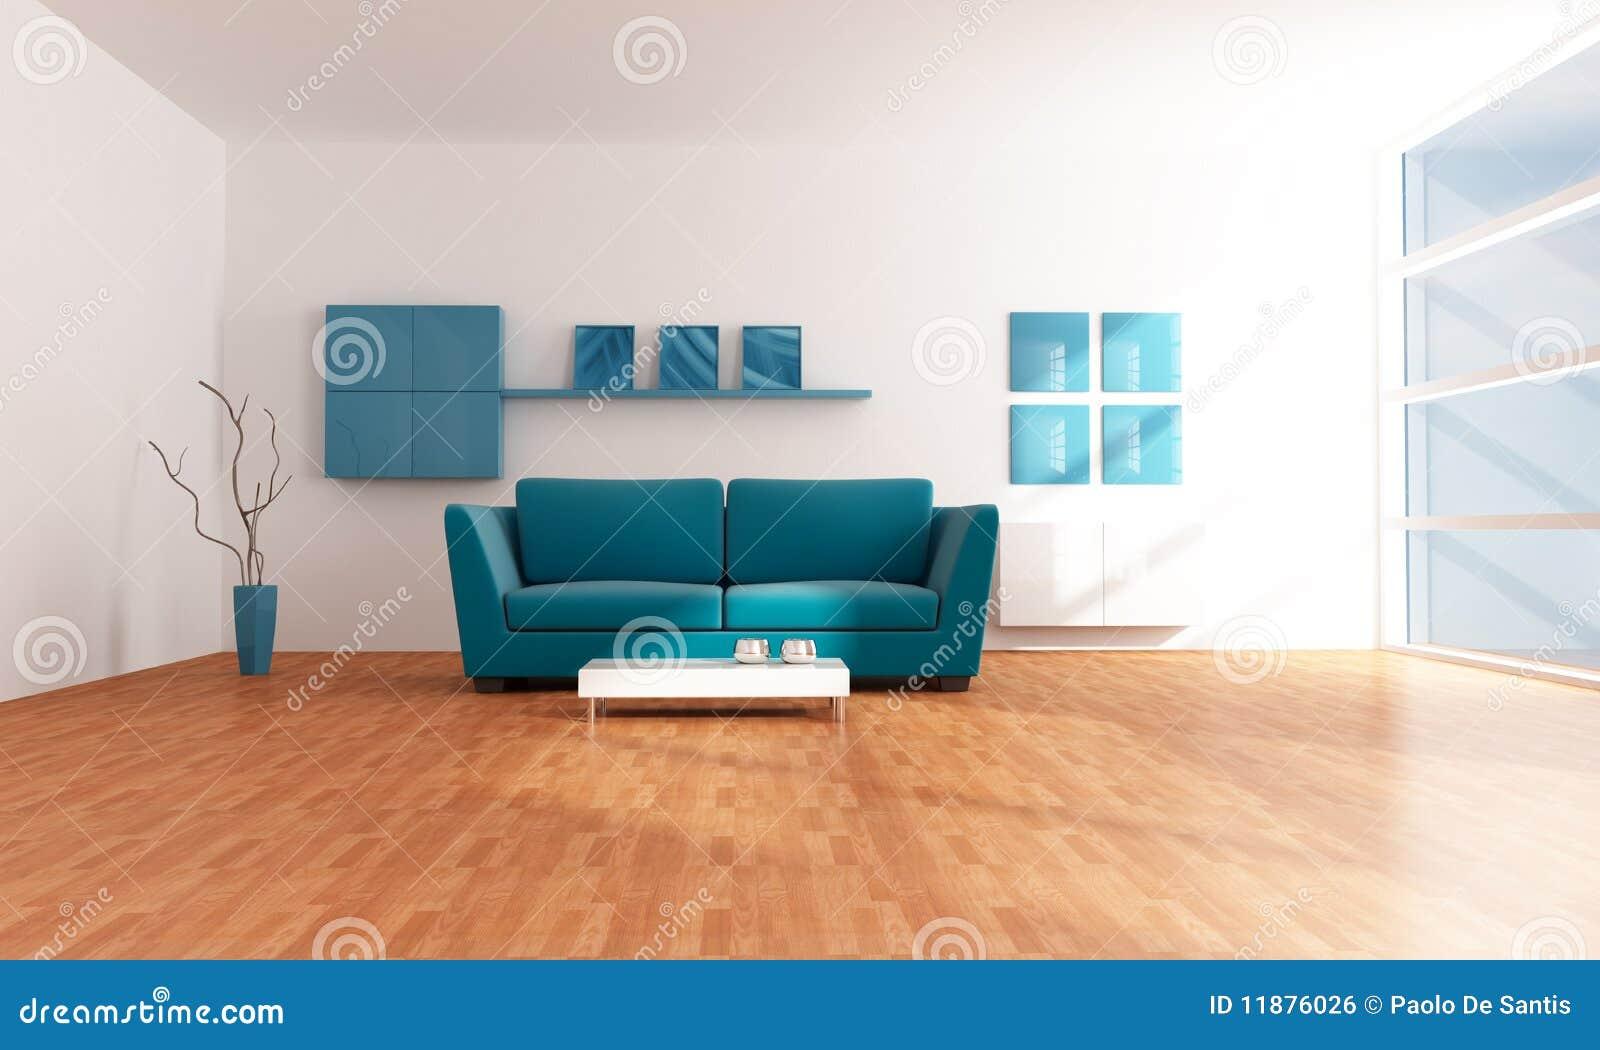 Sala De Estar Moderna Azul Brilhante Imagem de Stock Royalty Free  ~ Sala De Estar Azul